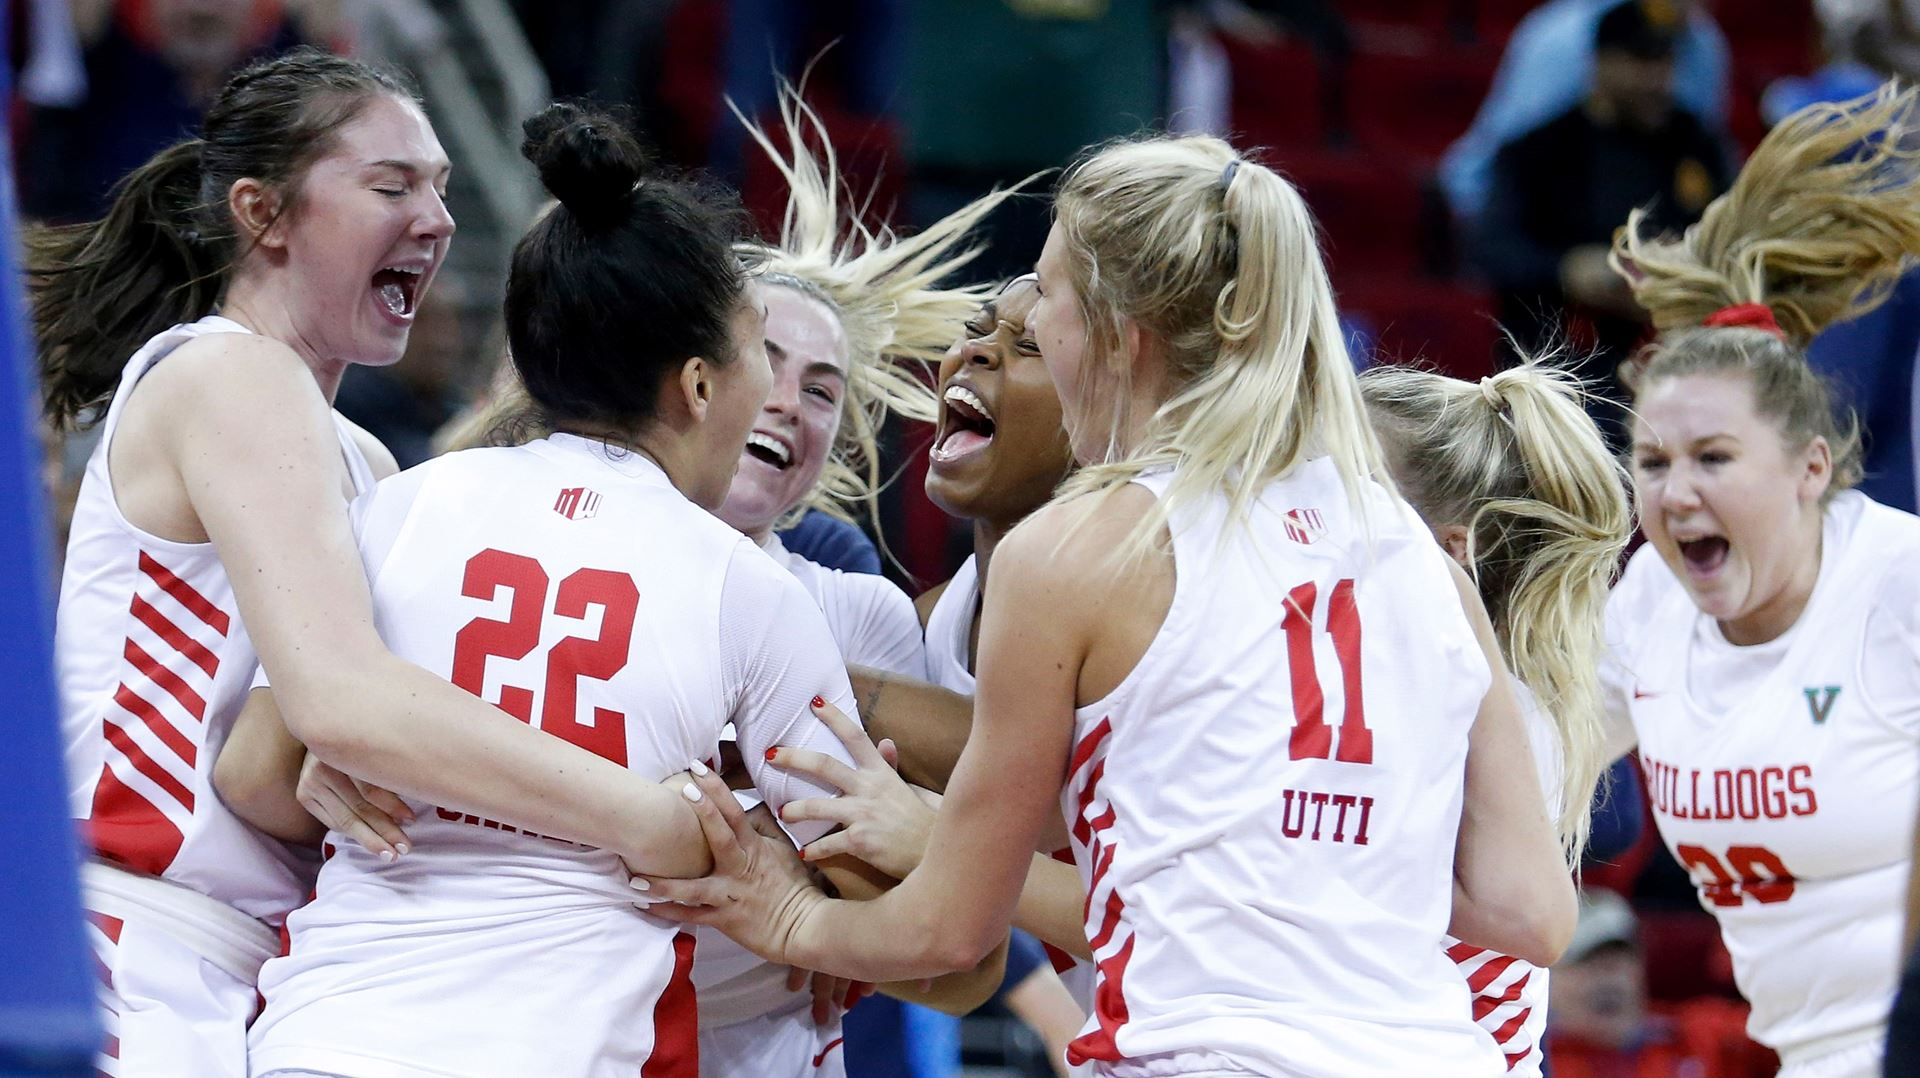 Photo of Fresno State women's basketball team celebrating a victoryta